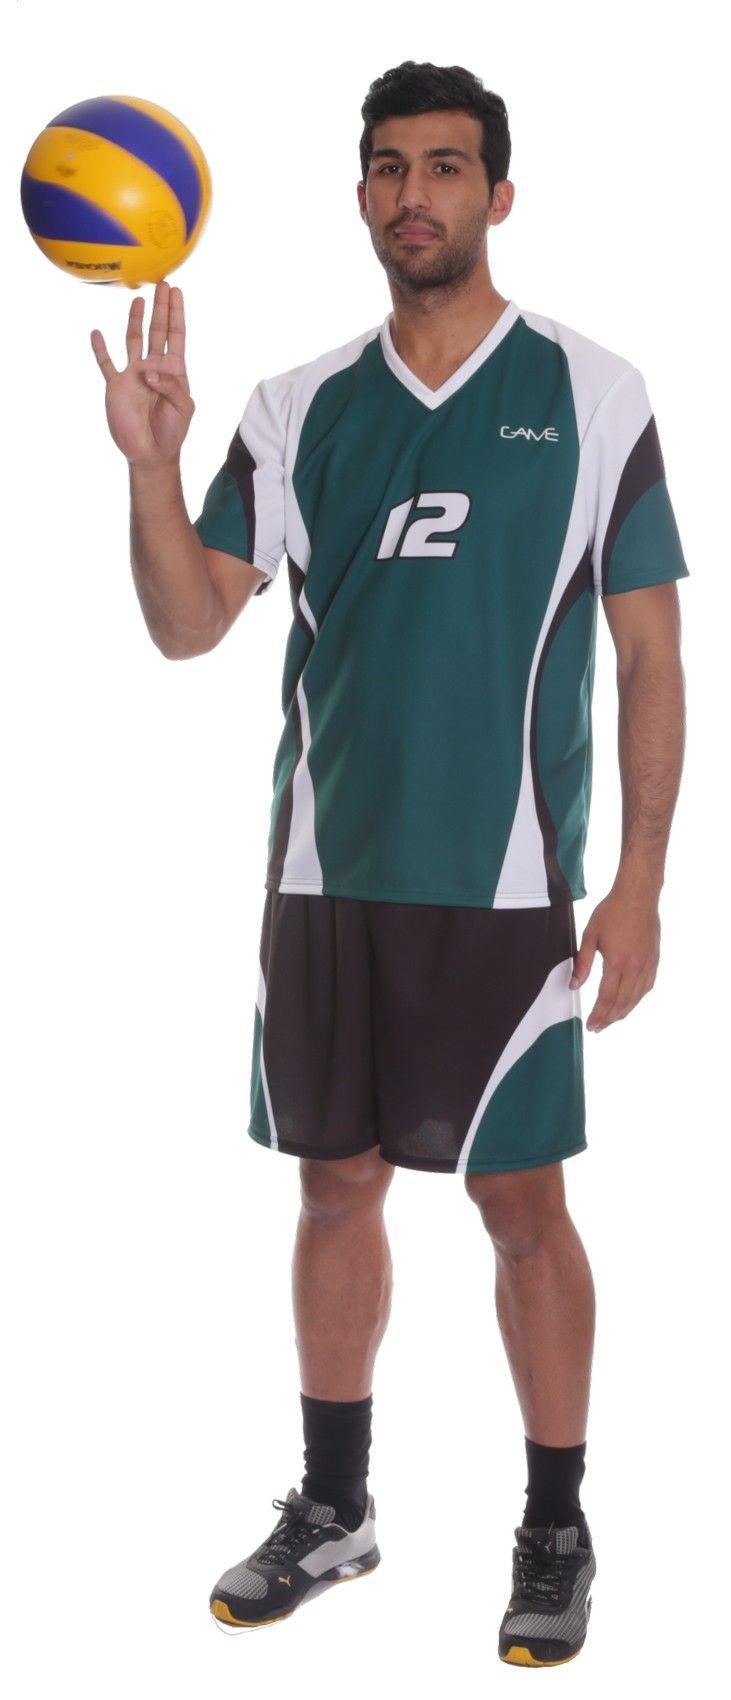 Mens Volleyball Uniforms | #Volleyball #VolleyballUniforms #VolleyballJerseys